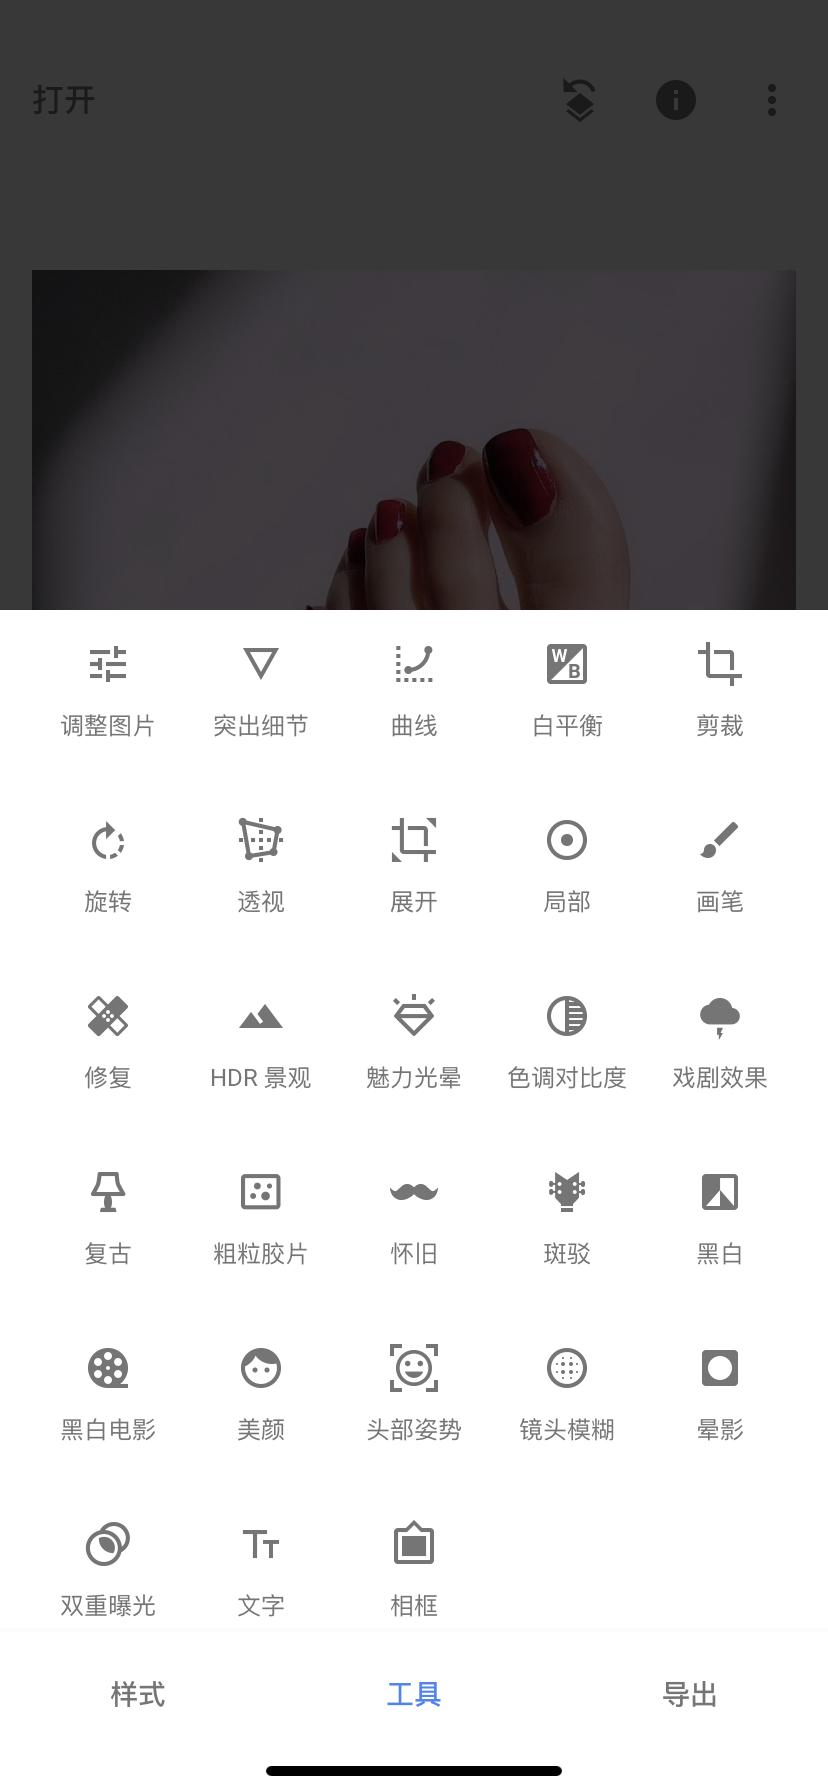 Snapseed 功能参数